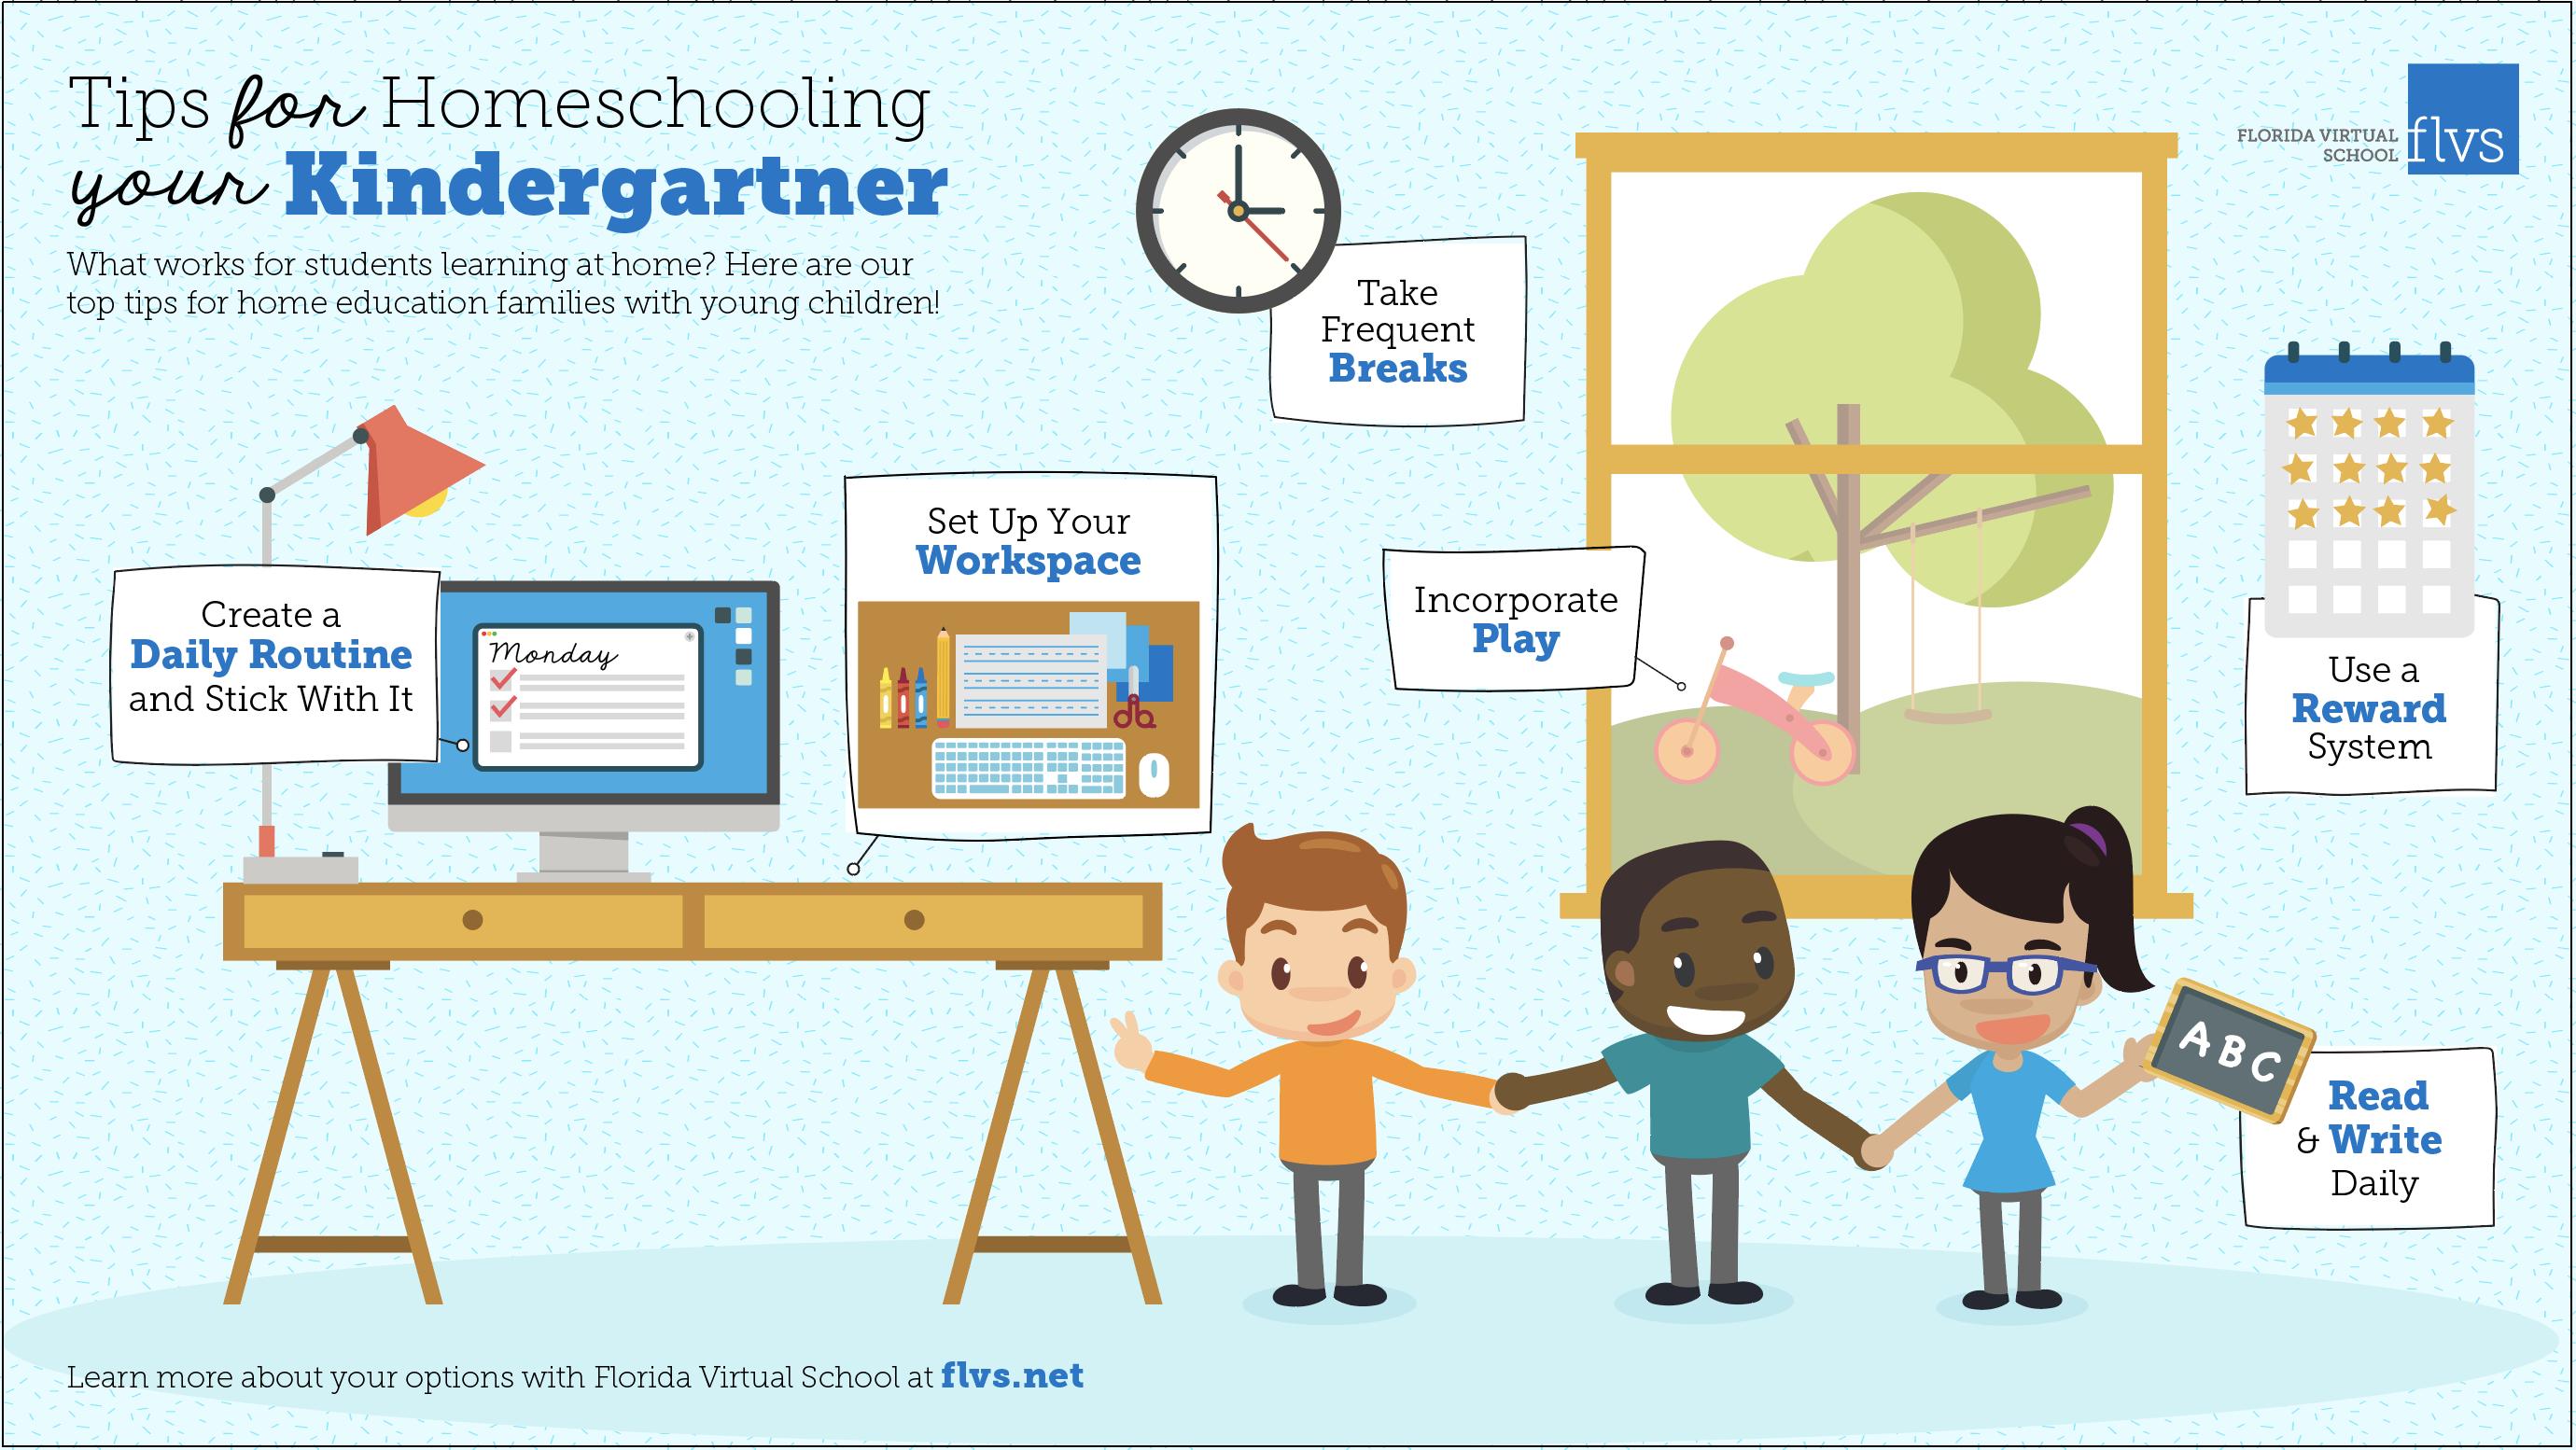 Tips For Homeschooling Your Kindergartner In 2020 Homeschool Kindergarten Homeschool Kindergarten